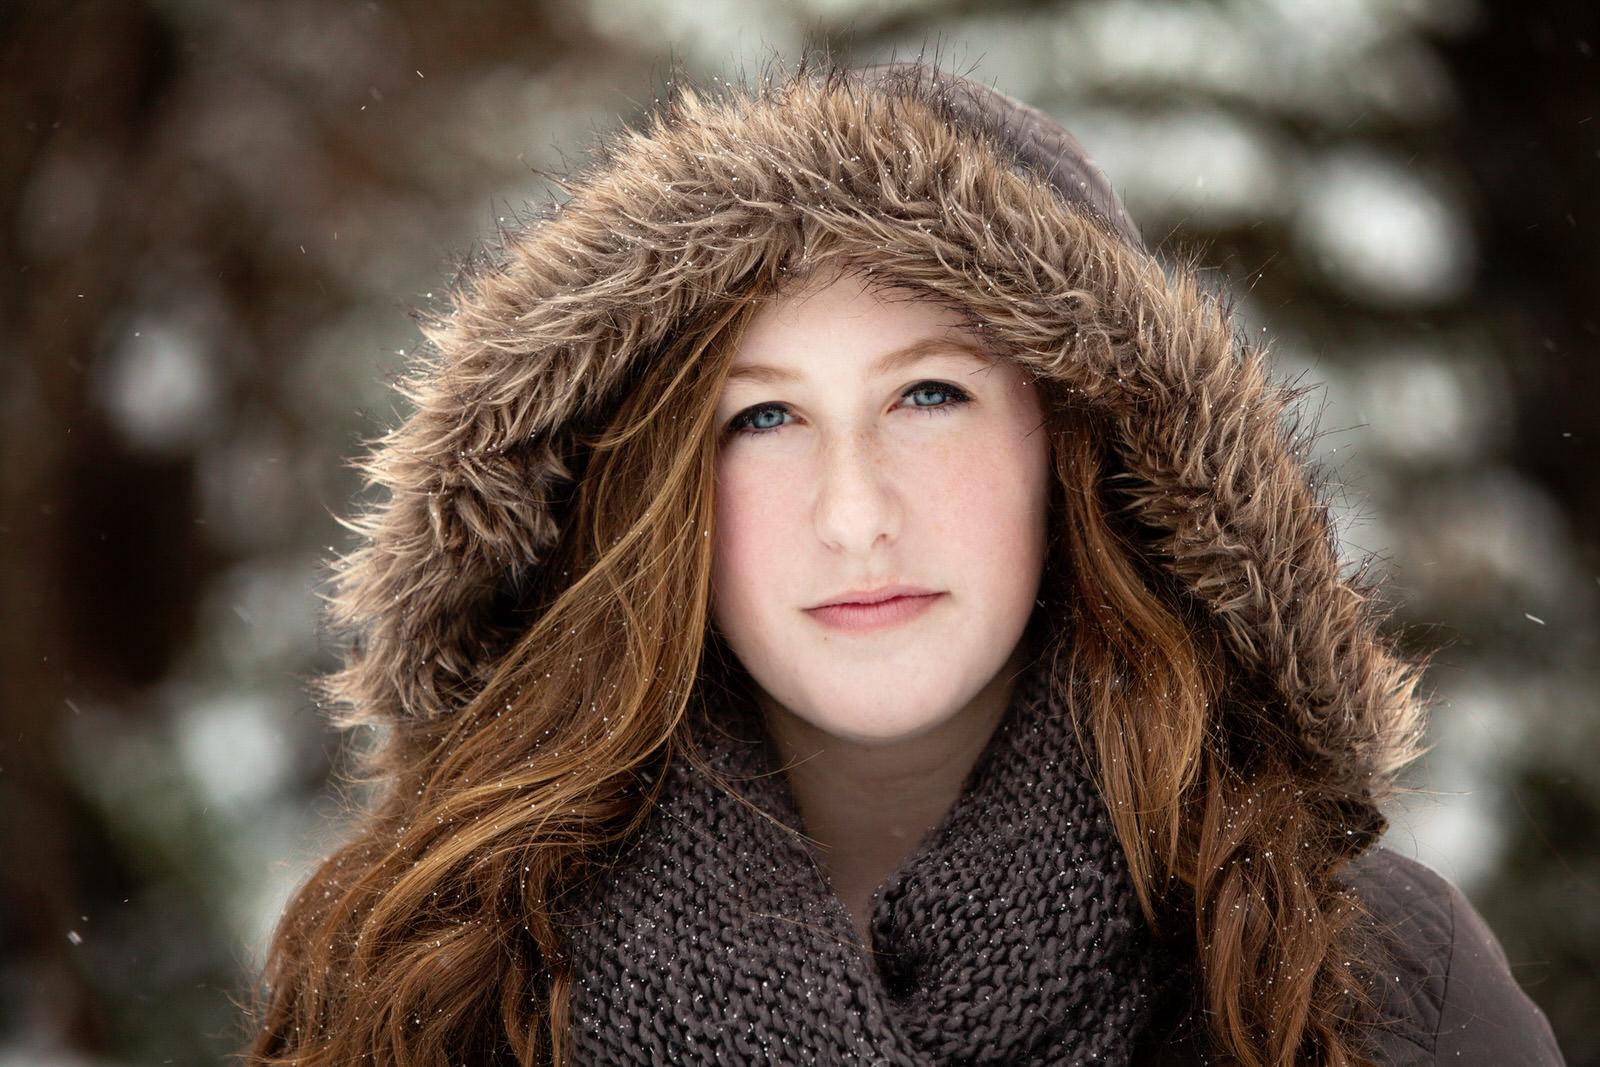 upper-peninsula-photographer-high-school-senior-marquette-ishpeming-negaunee-michigan-jackie-solomon-045.jpg